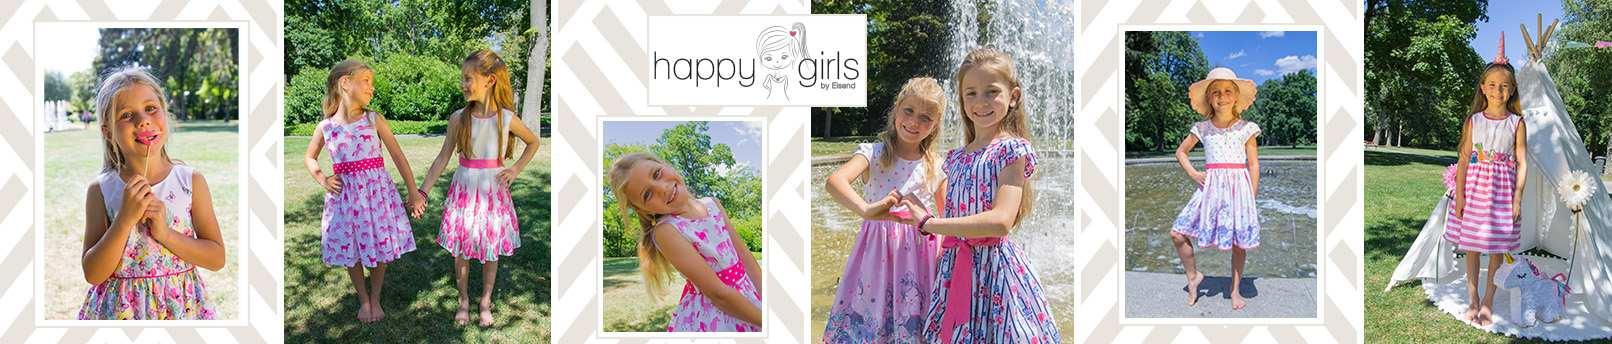 Shop happy girls